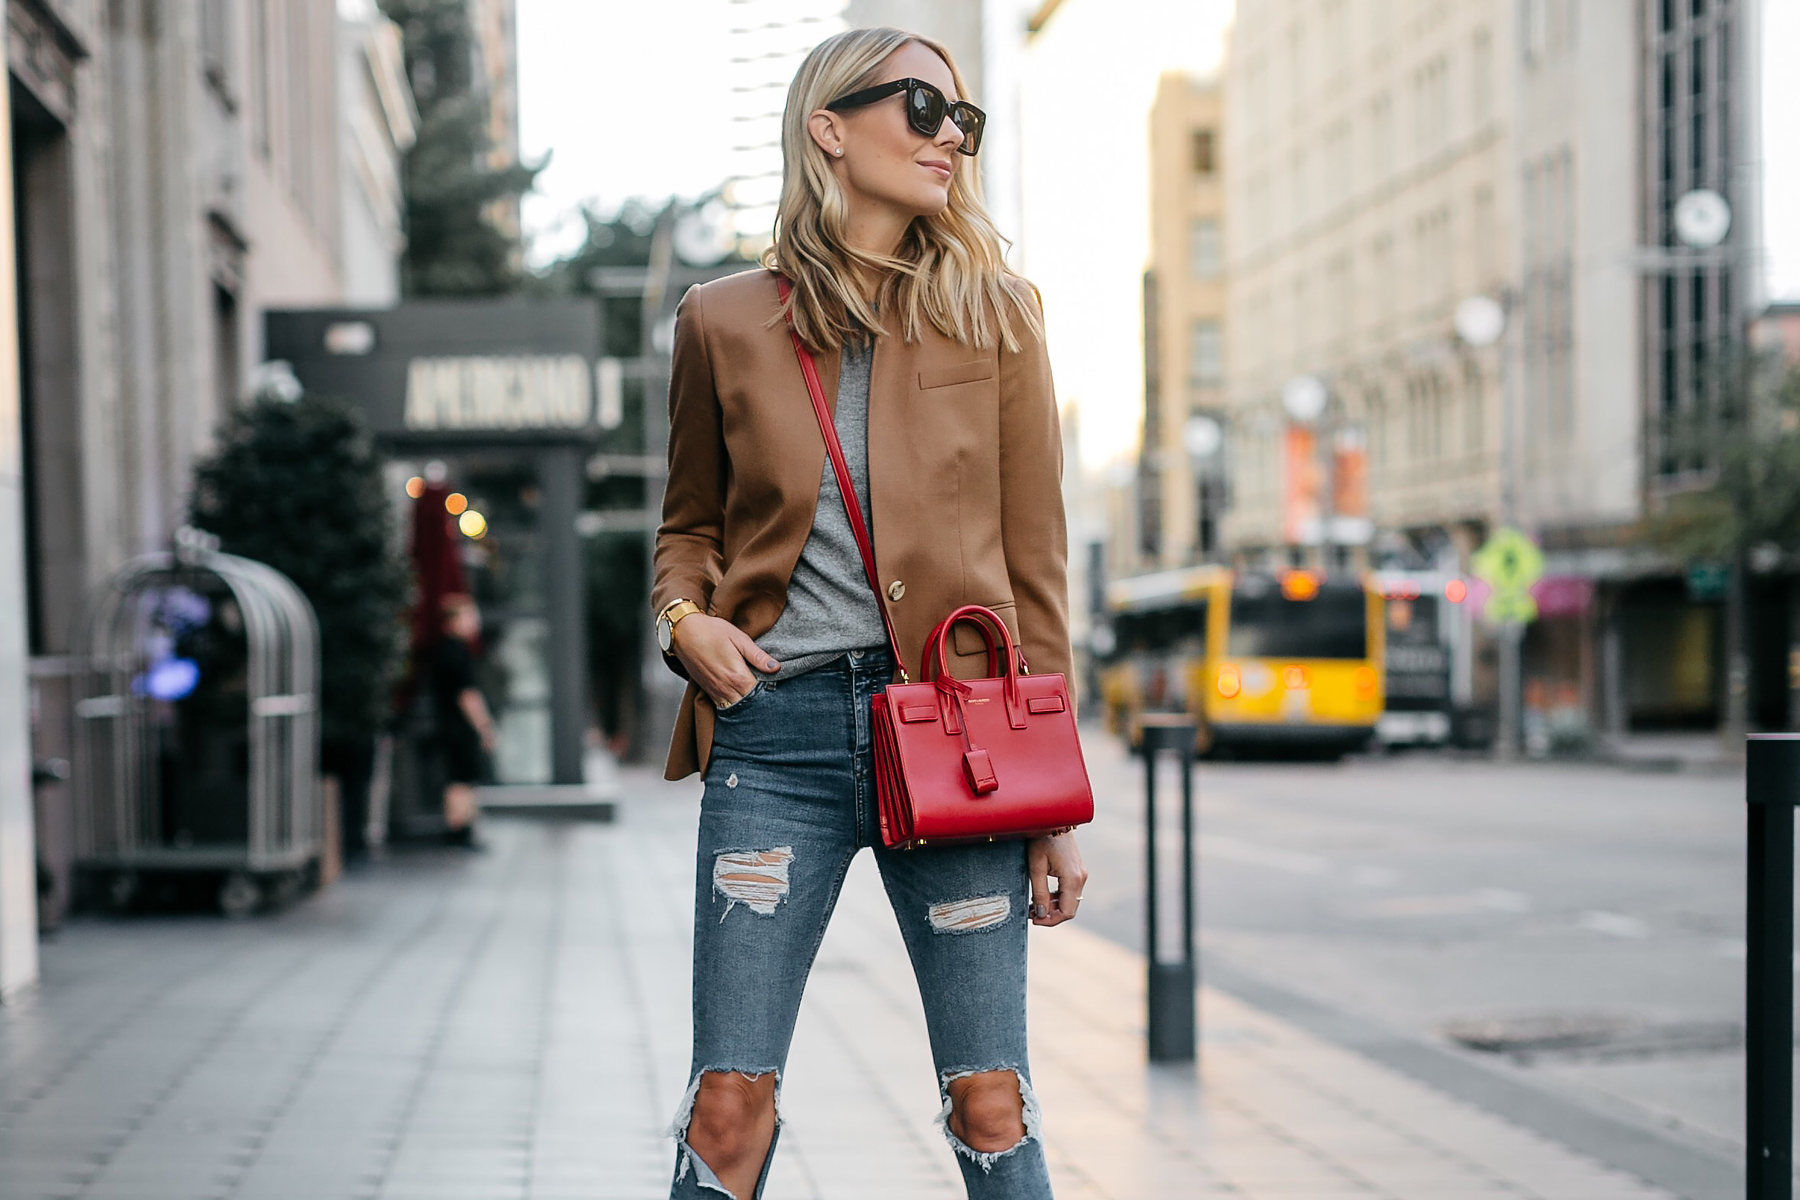 Blonde Woman Wearing Jcrew Camel Blazer Grey Sweater Ripped Denim Jeans Saint Laurent Sac De Jour Nano Red Bag Fashion Jackson Dallas Blogger Fashion Blogger Street Style